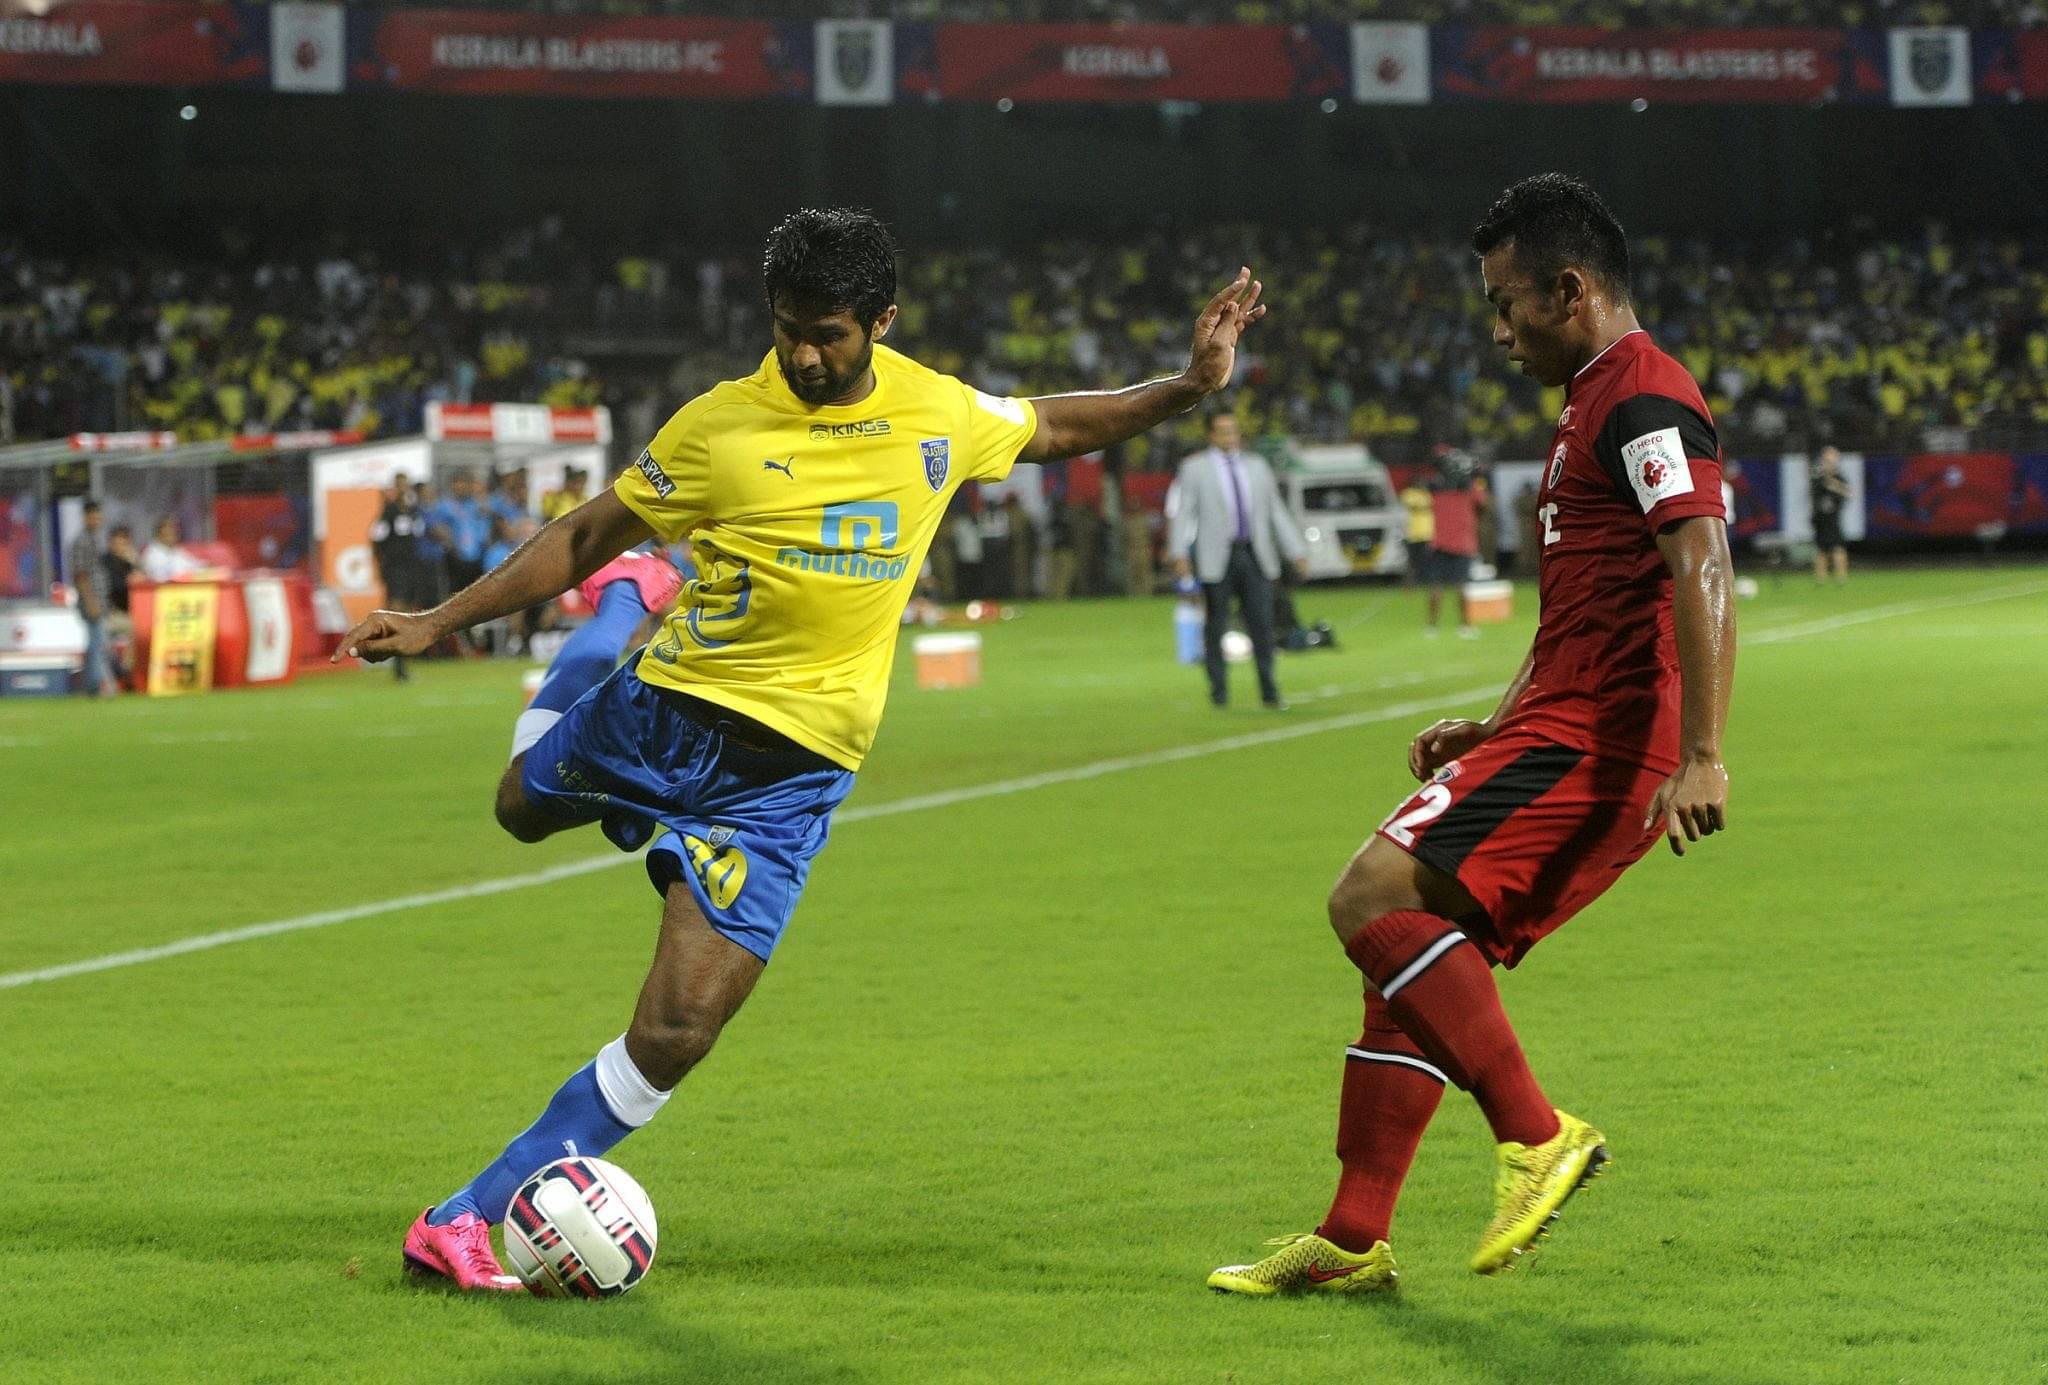 FCG vs KBFC Dream11 Prediction : Goa Vs Kerala Blasters Best Dream 11 Team for Indian Super League 2019-20 Match